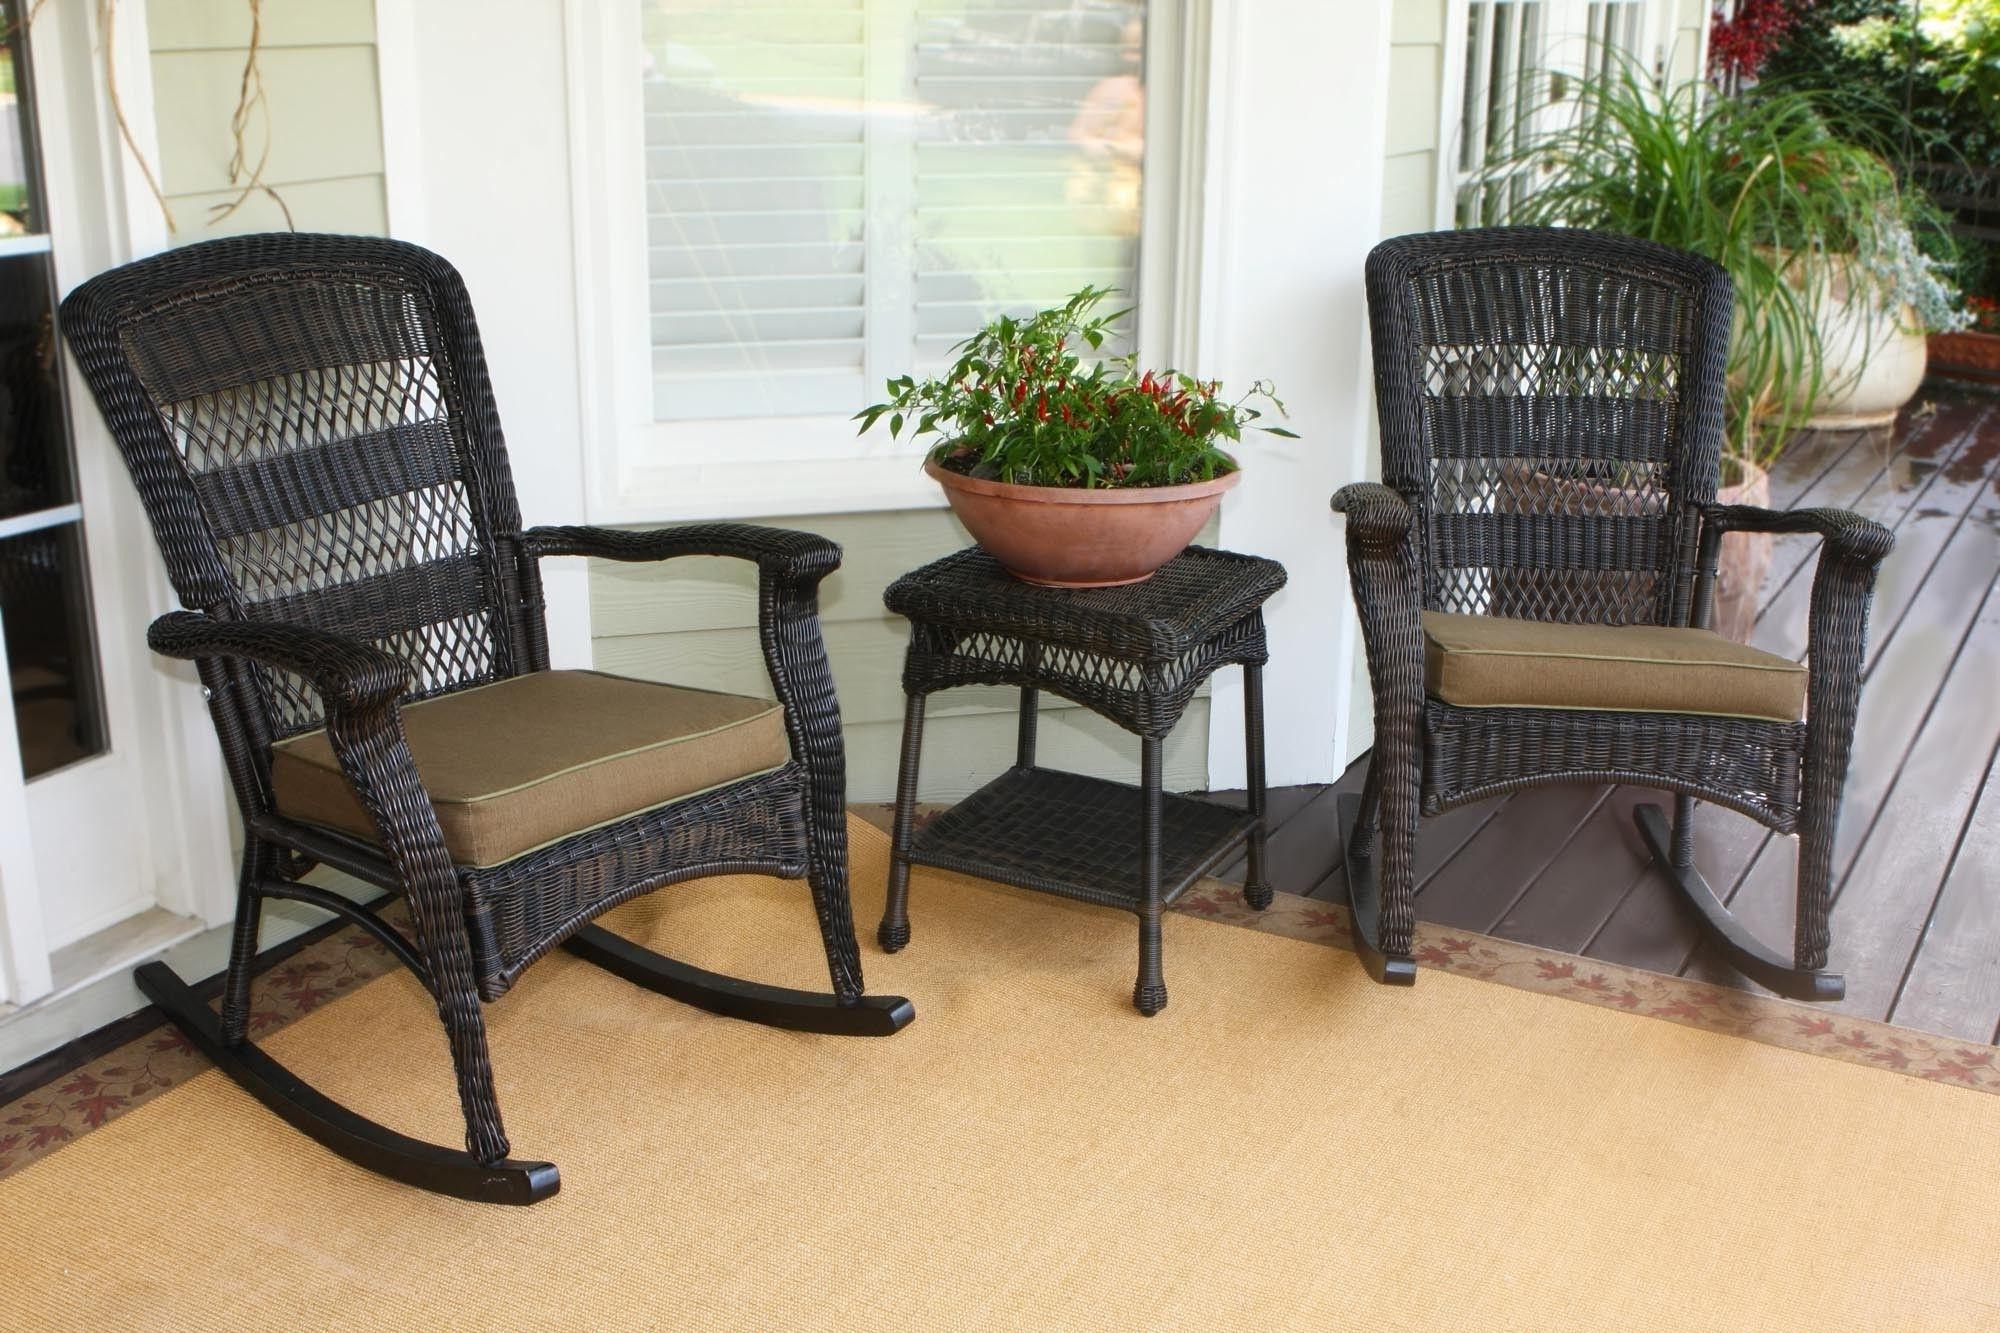 Outdoor Wicker Rocking Chairs Regarding Most Popular Fancy Wicker Outdoor Chair Design Inspiration : Remarkable Dark (View 13 of 20)